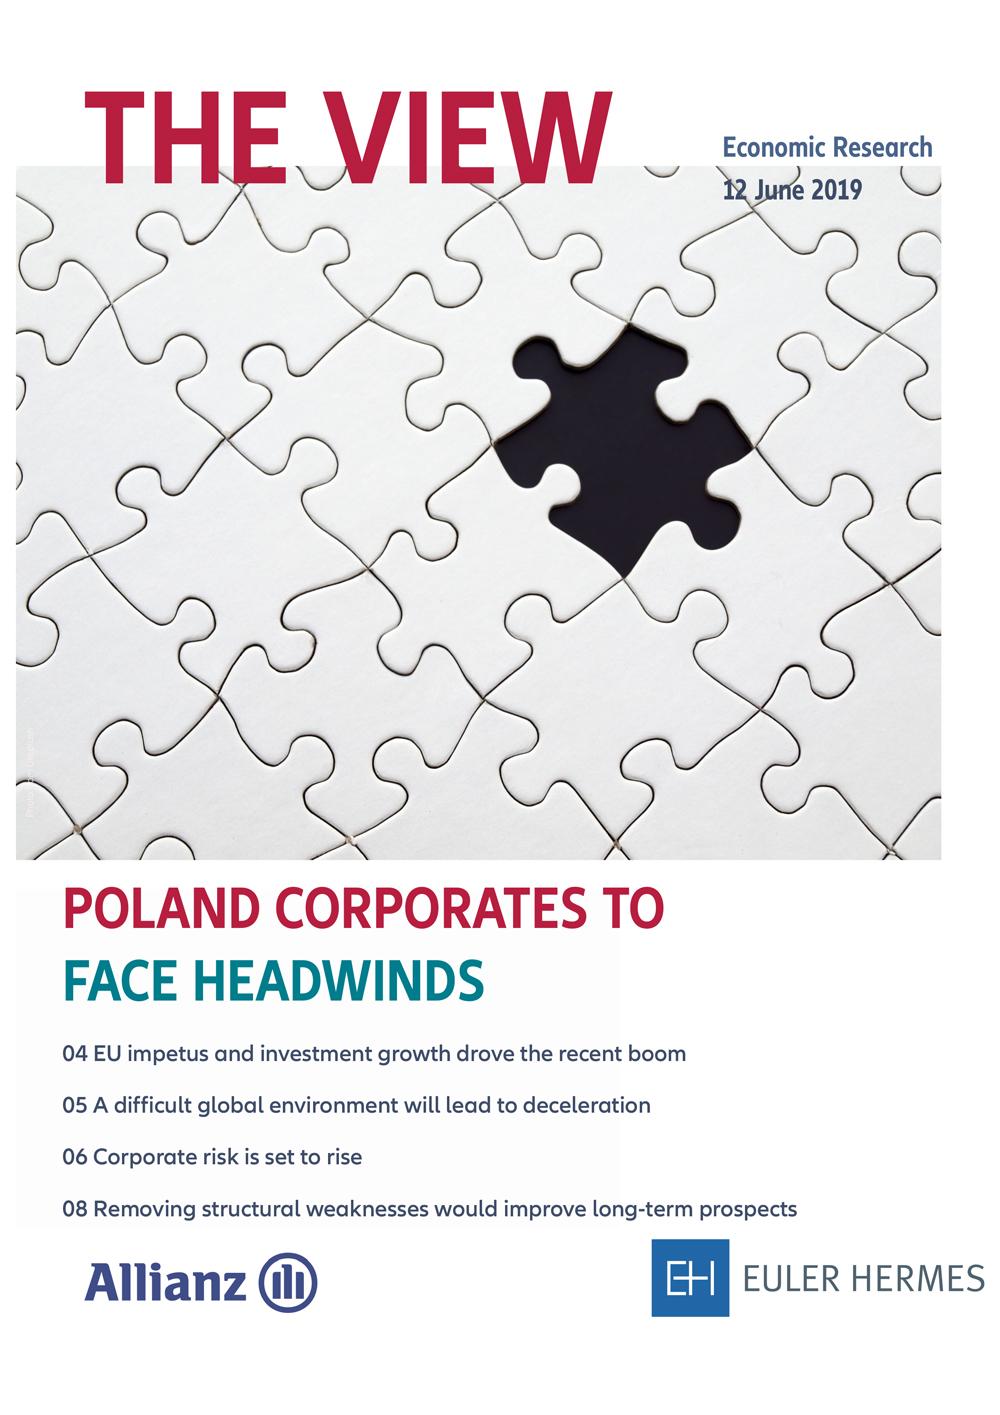 Poland corporates to face headwinds